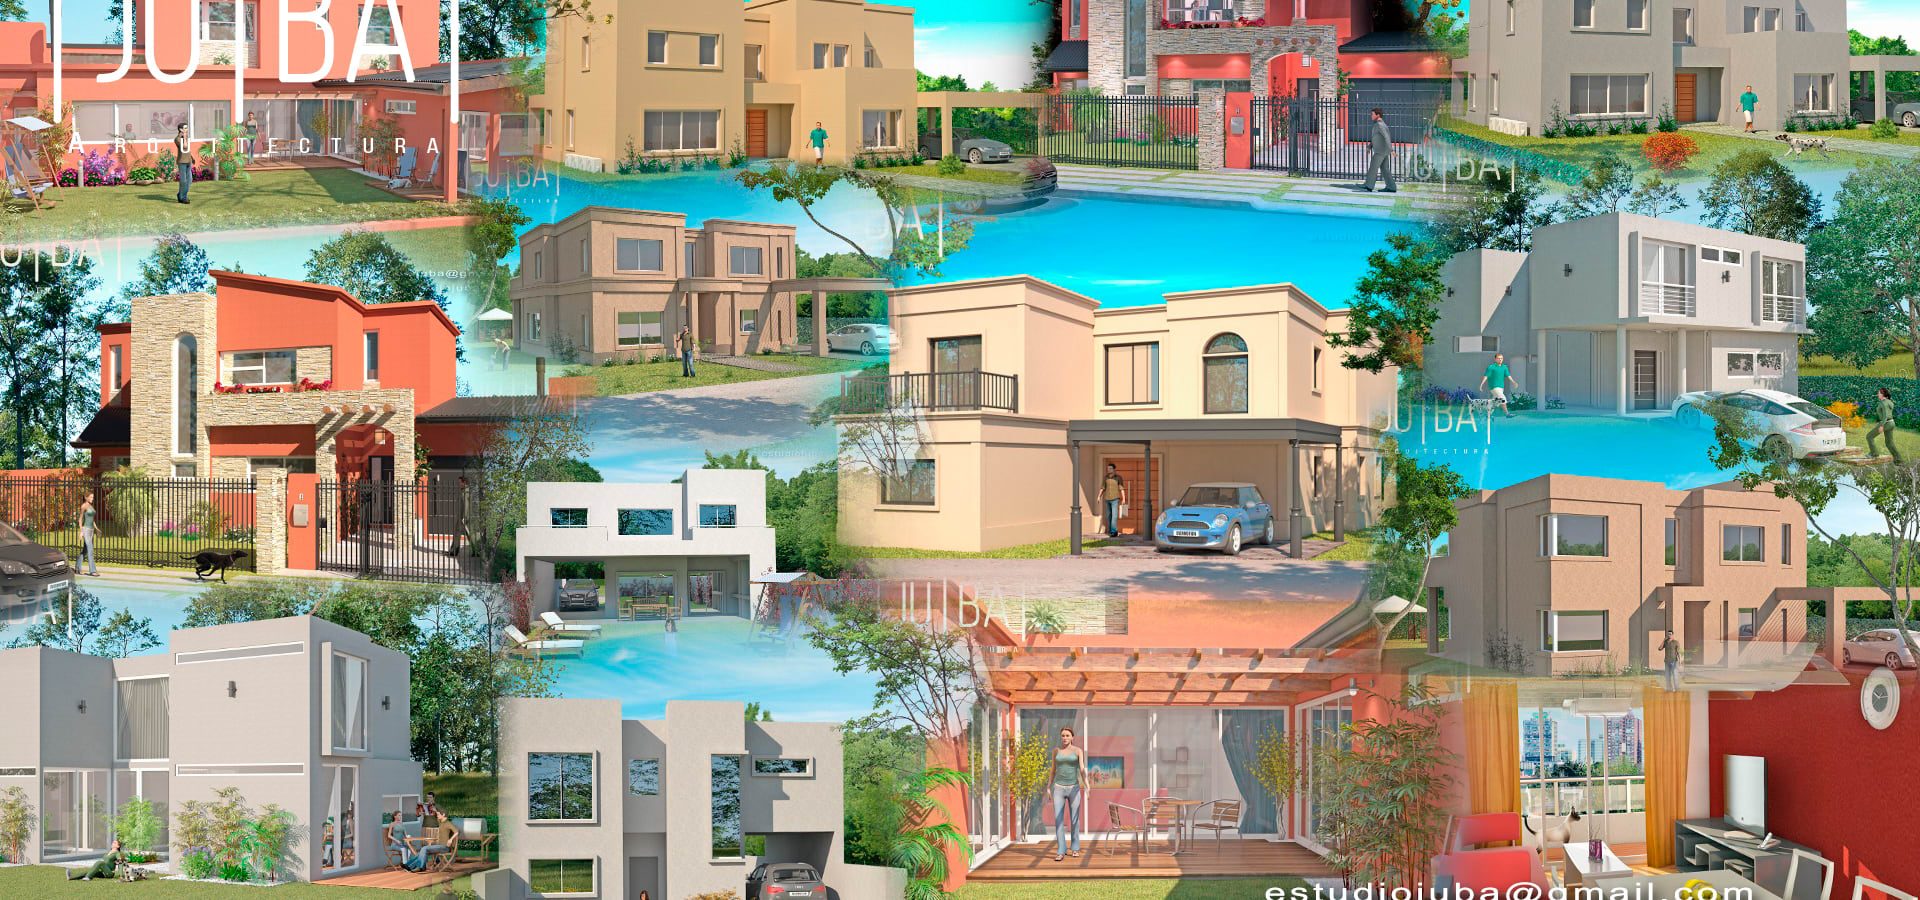 JUBA arquitectura